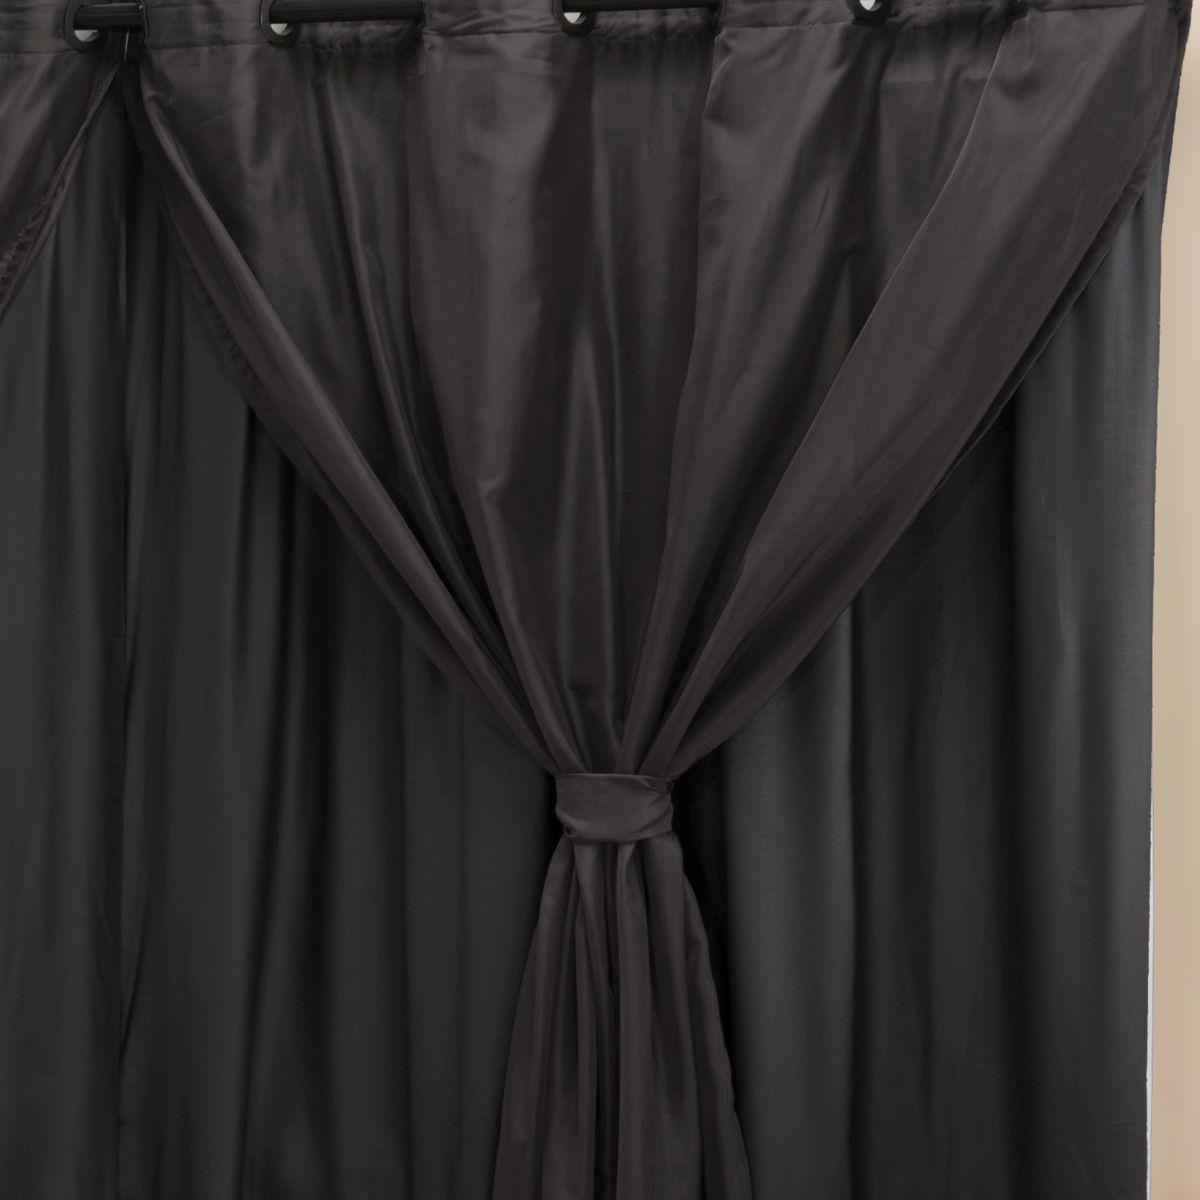 Cortina Blackout PVC c/ Voil Preto Corta Luz 2,00m X 1,40m